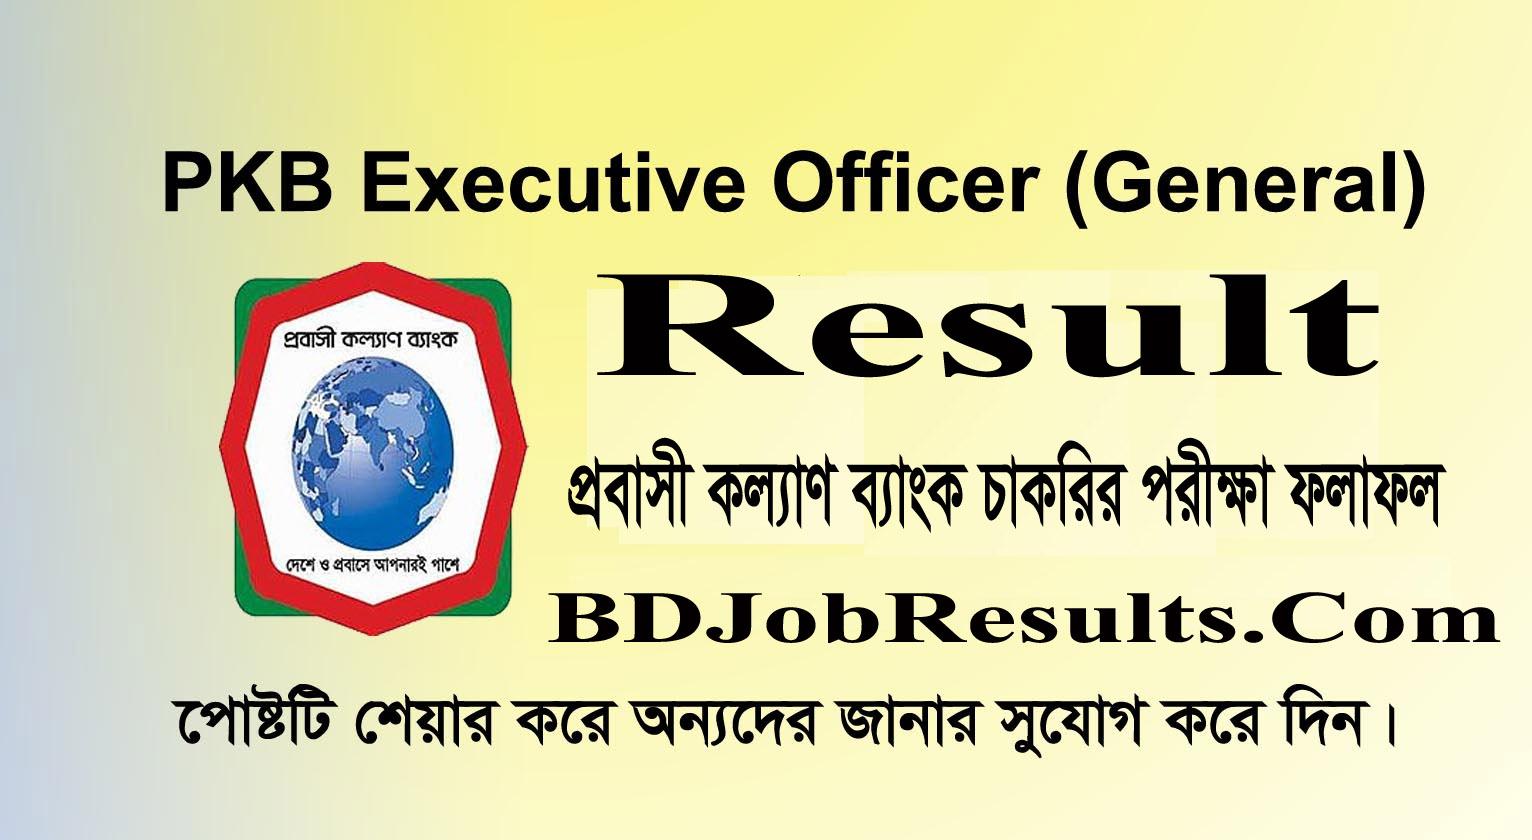 PKB Exam Result 2019